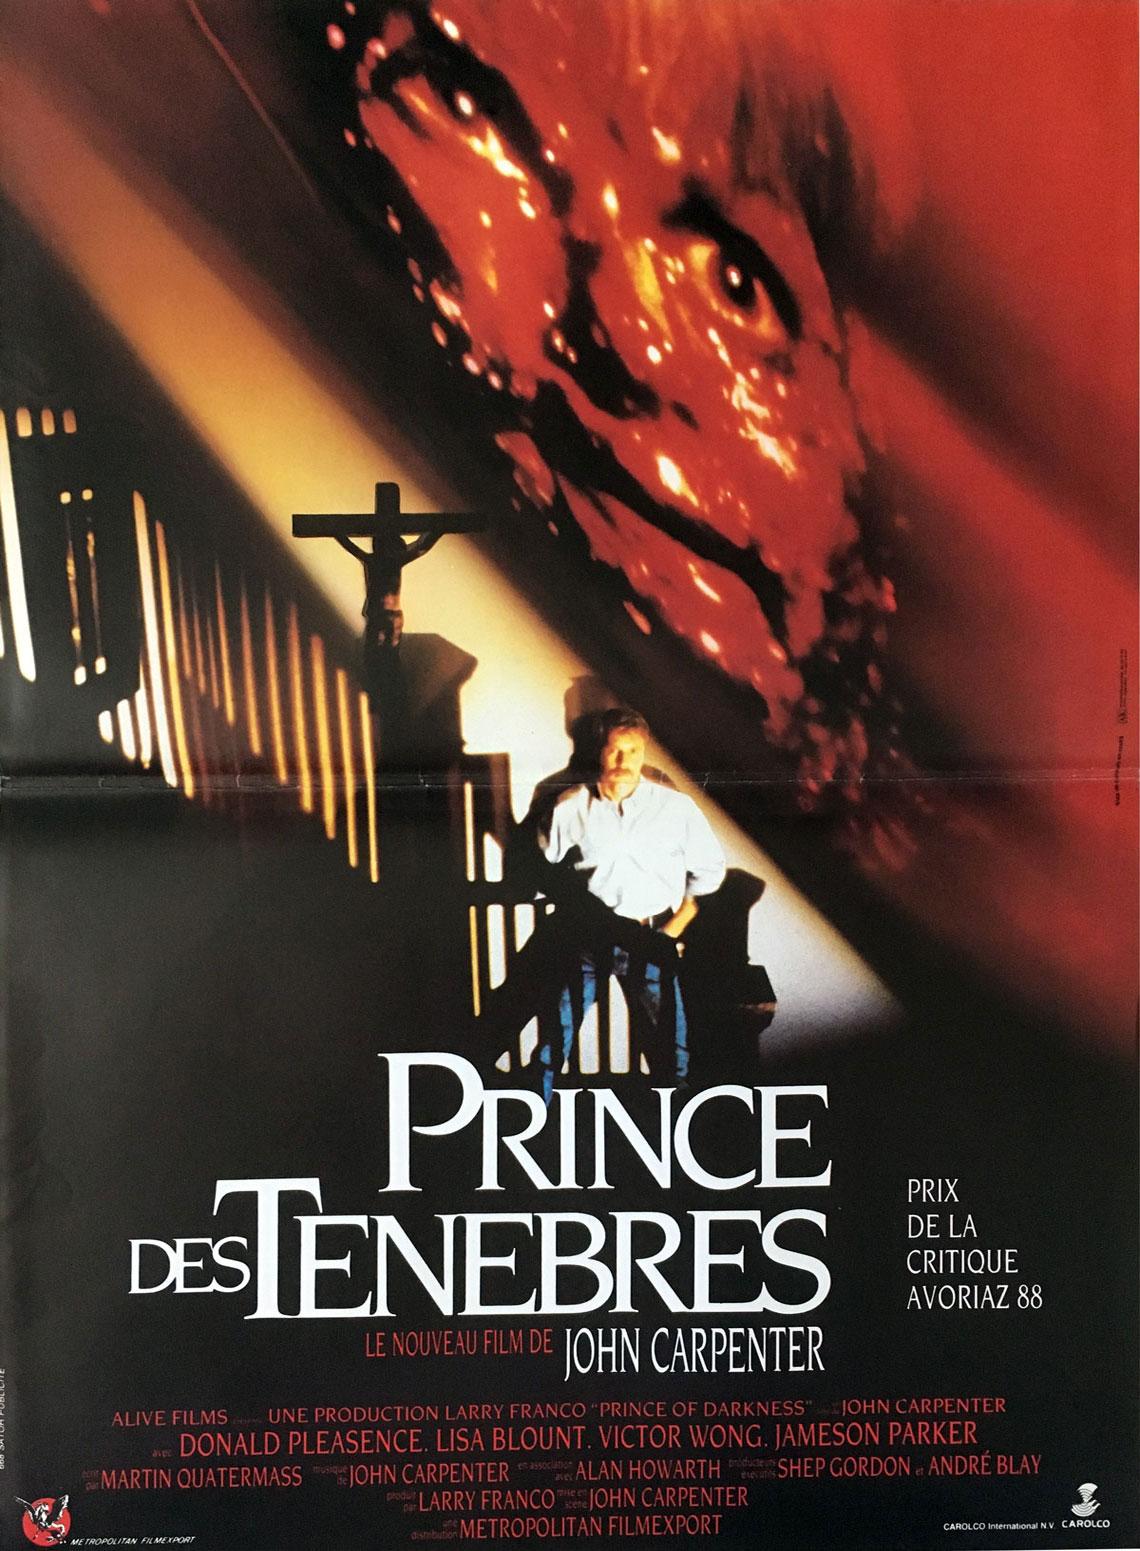 PRINCE OF DARKNESS - 1987 - John Carpenter Prince-des-tenebres-affiche-de-film-40x60-cm-1987-donald-pleasence-john-carpenter